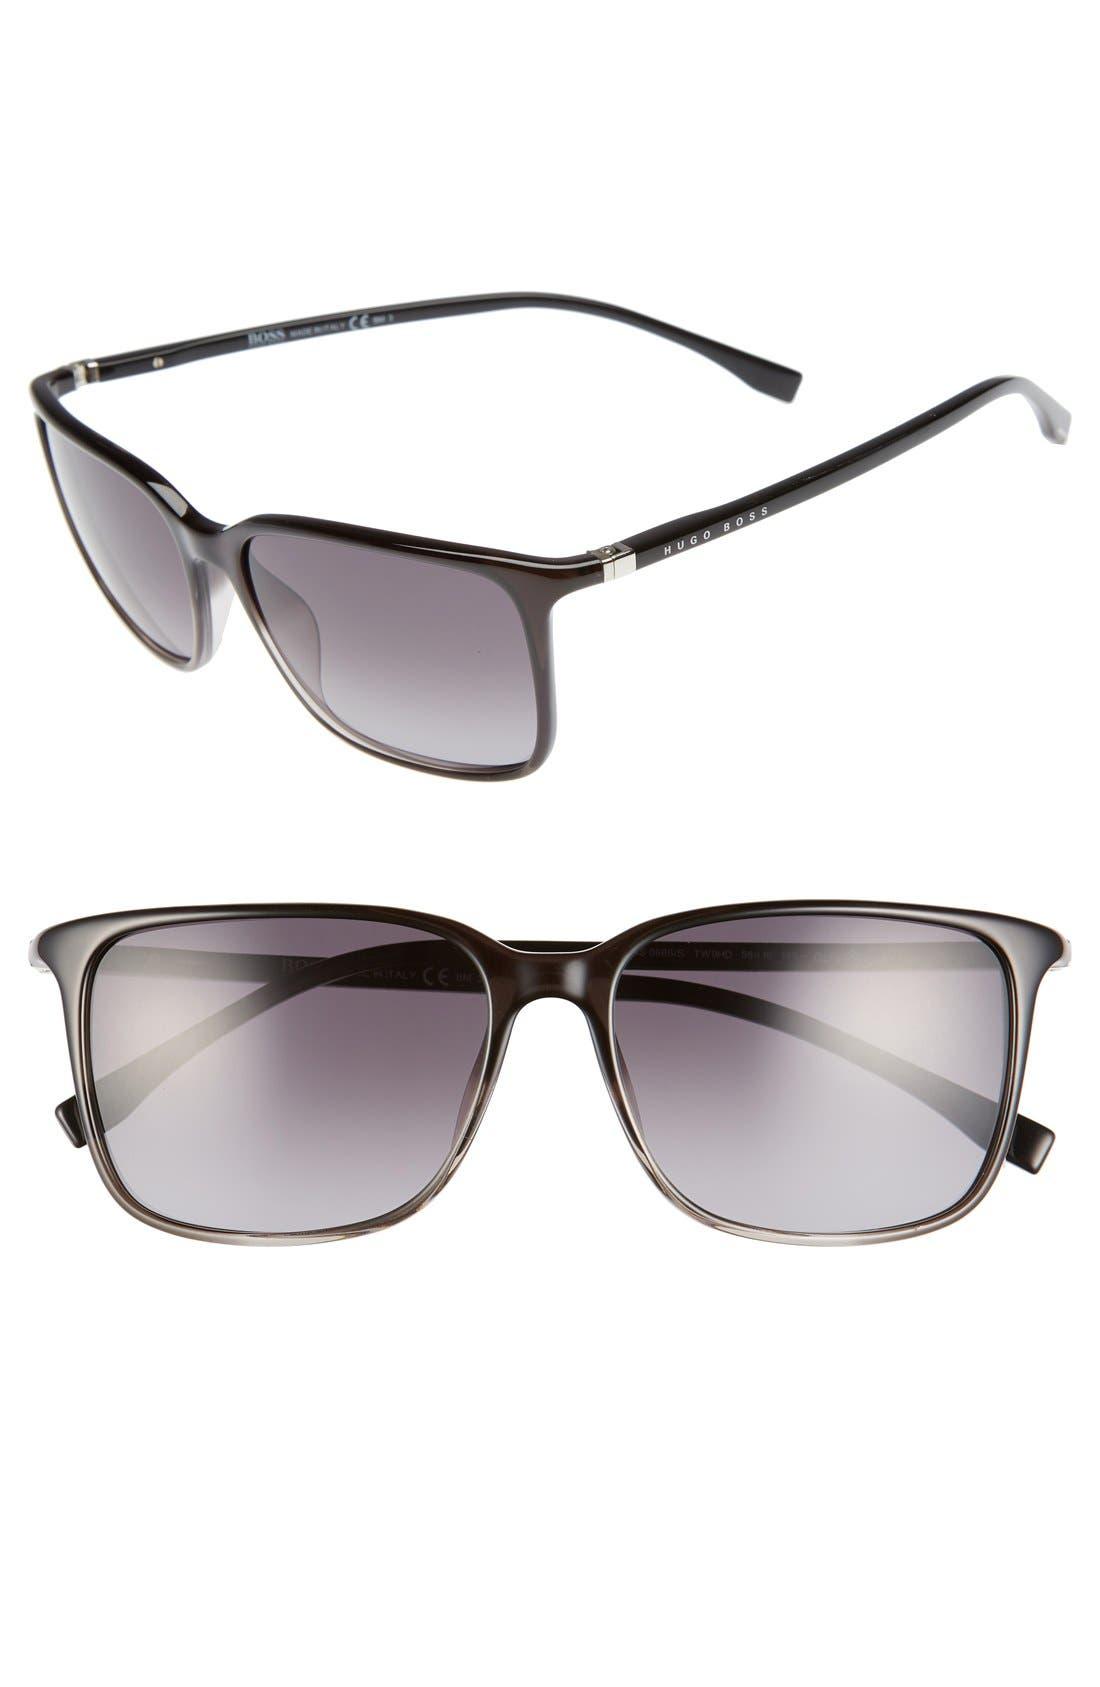 Alternate Image 1 Selected - BOSS '0666/S' 52mm Sunglasses